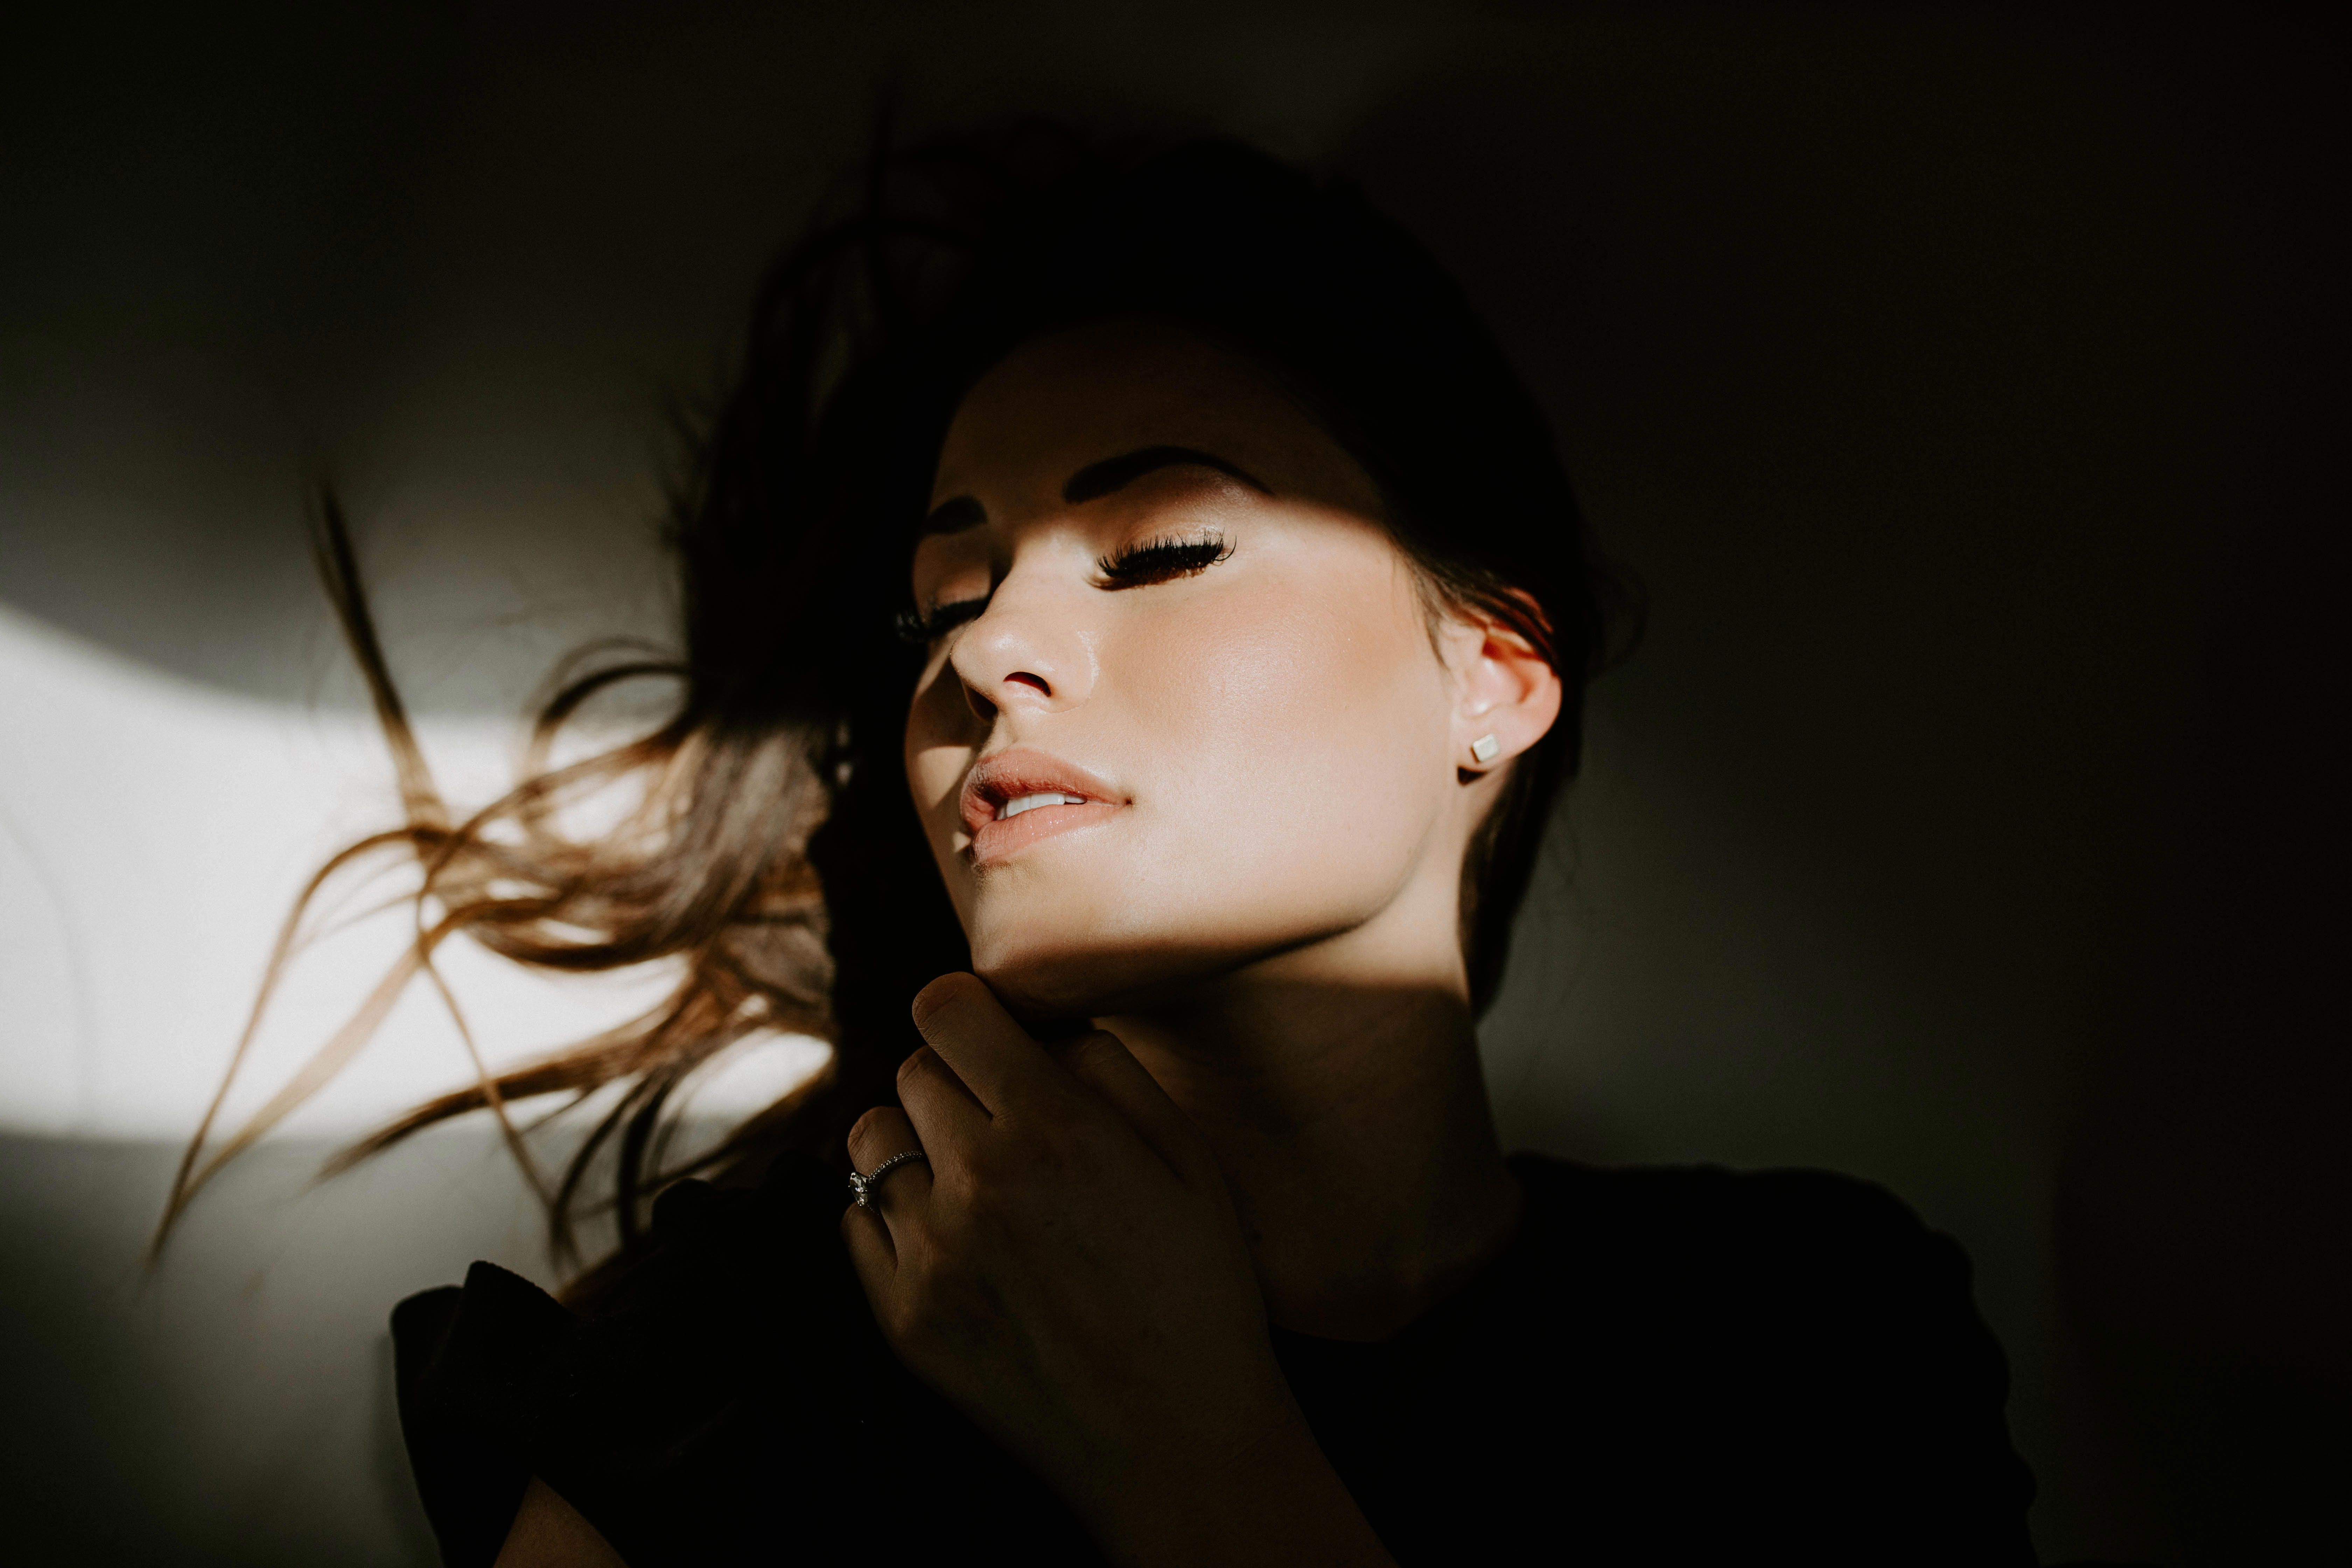 Hard Light Photography